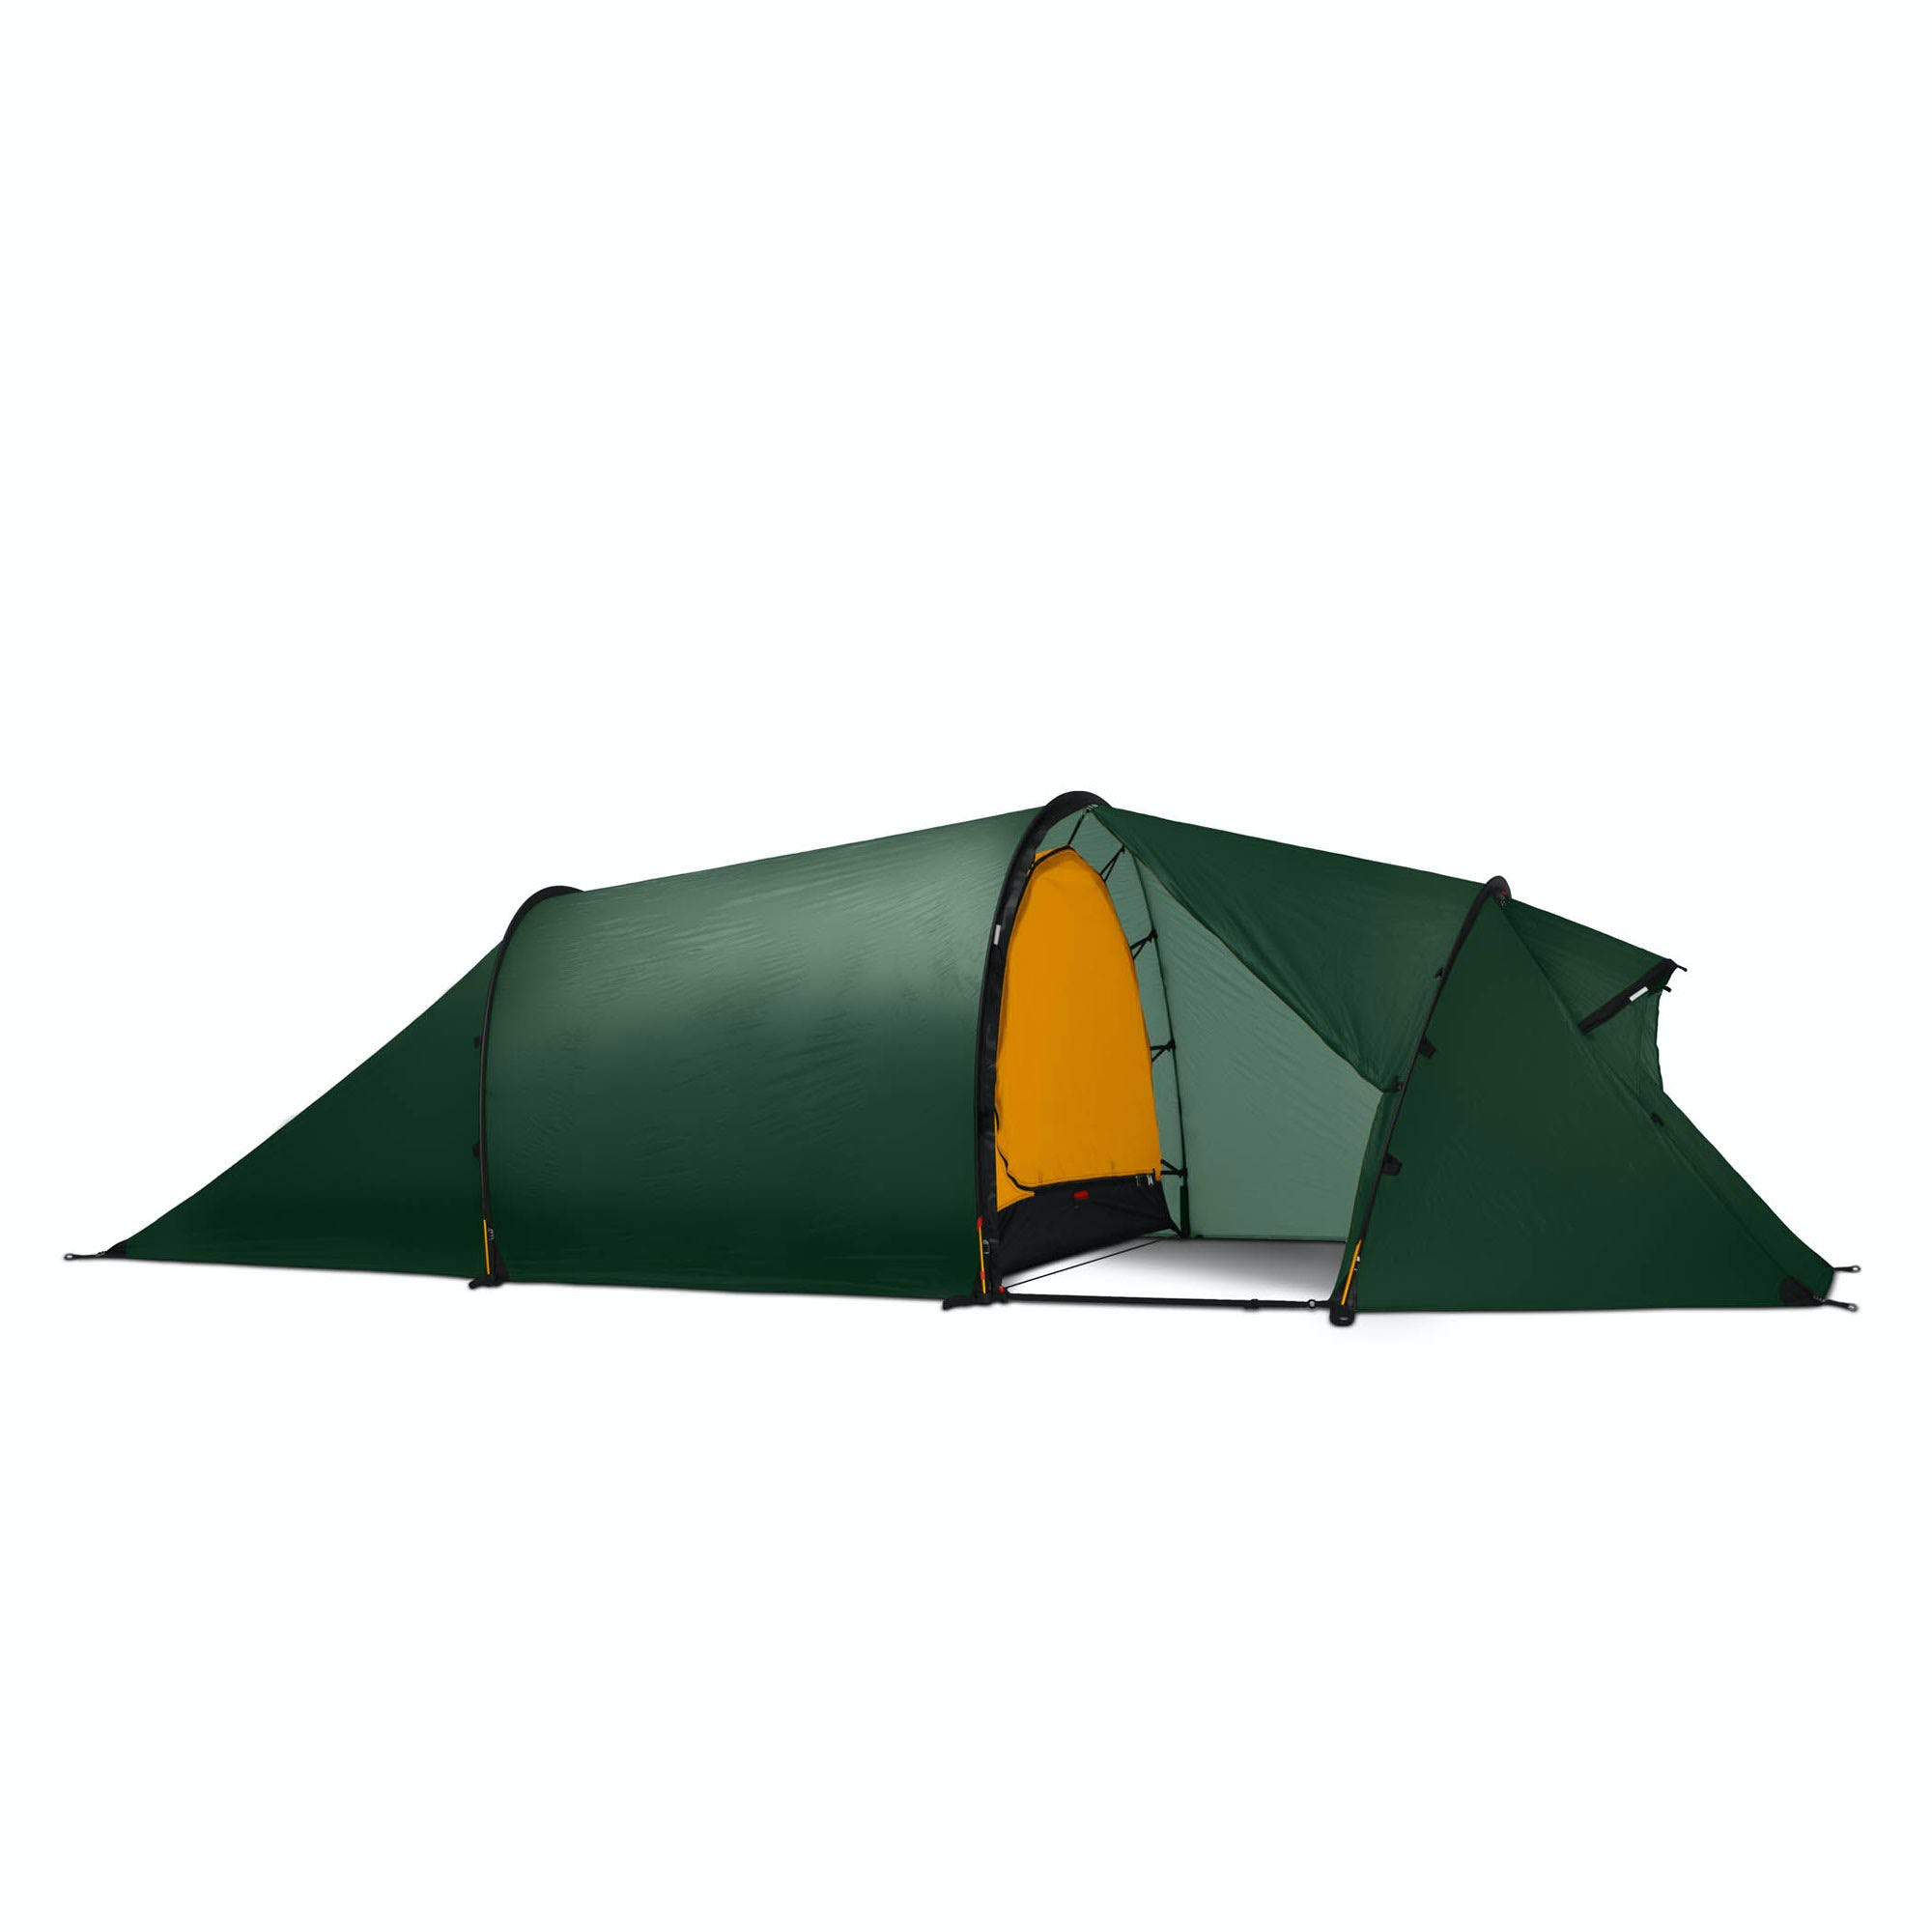 Hilleberg Nallo 3 GT Tent (Green)